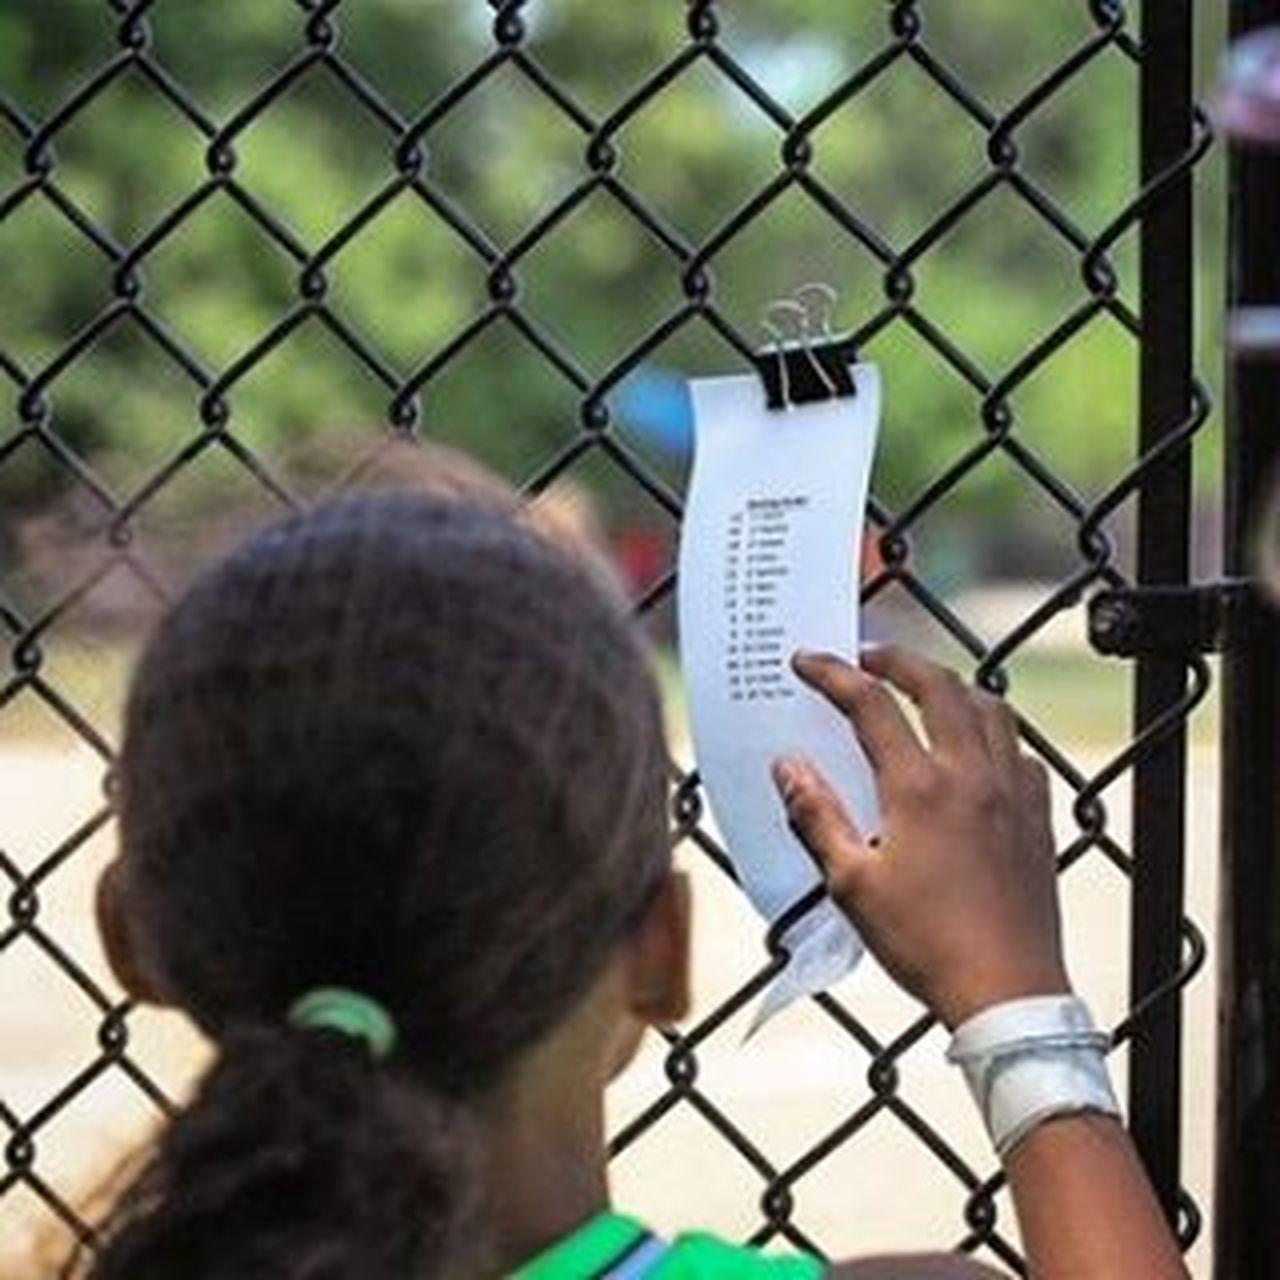 Am I in? Softball Baseball Baseballplayer Hardball Bench Softballlife BaseballLife Softballplayer